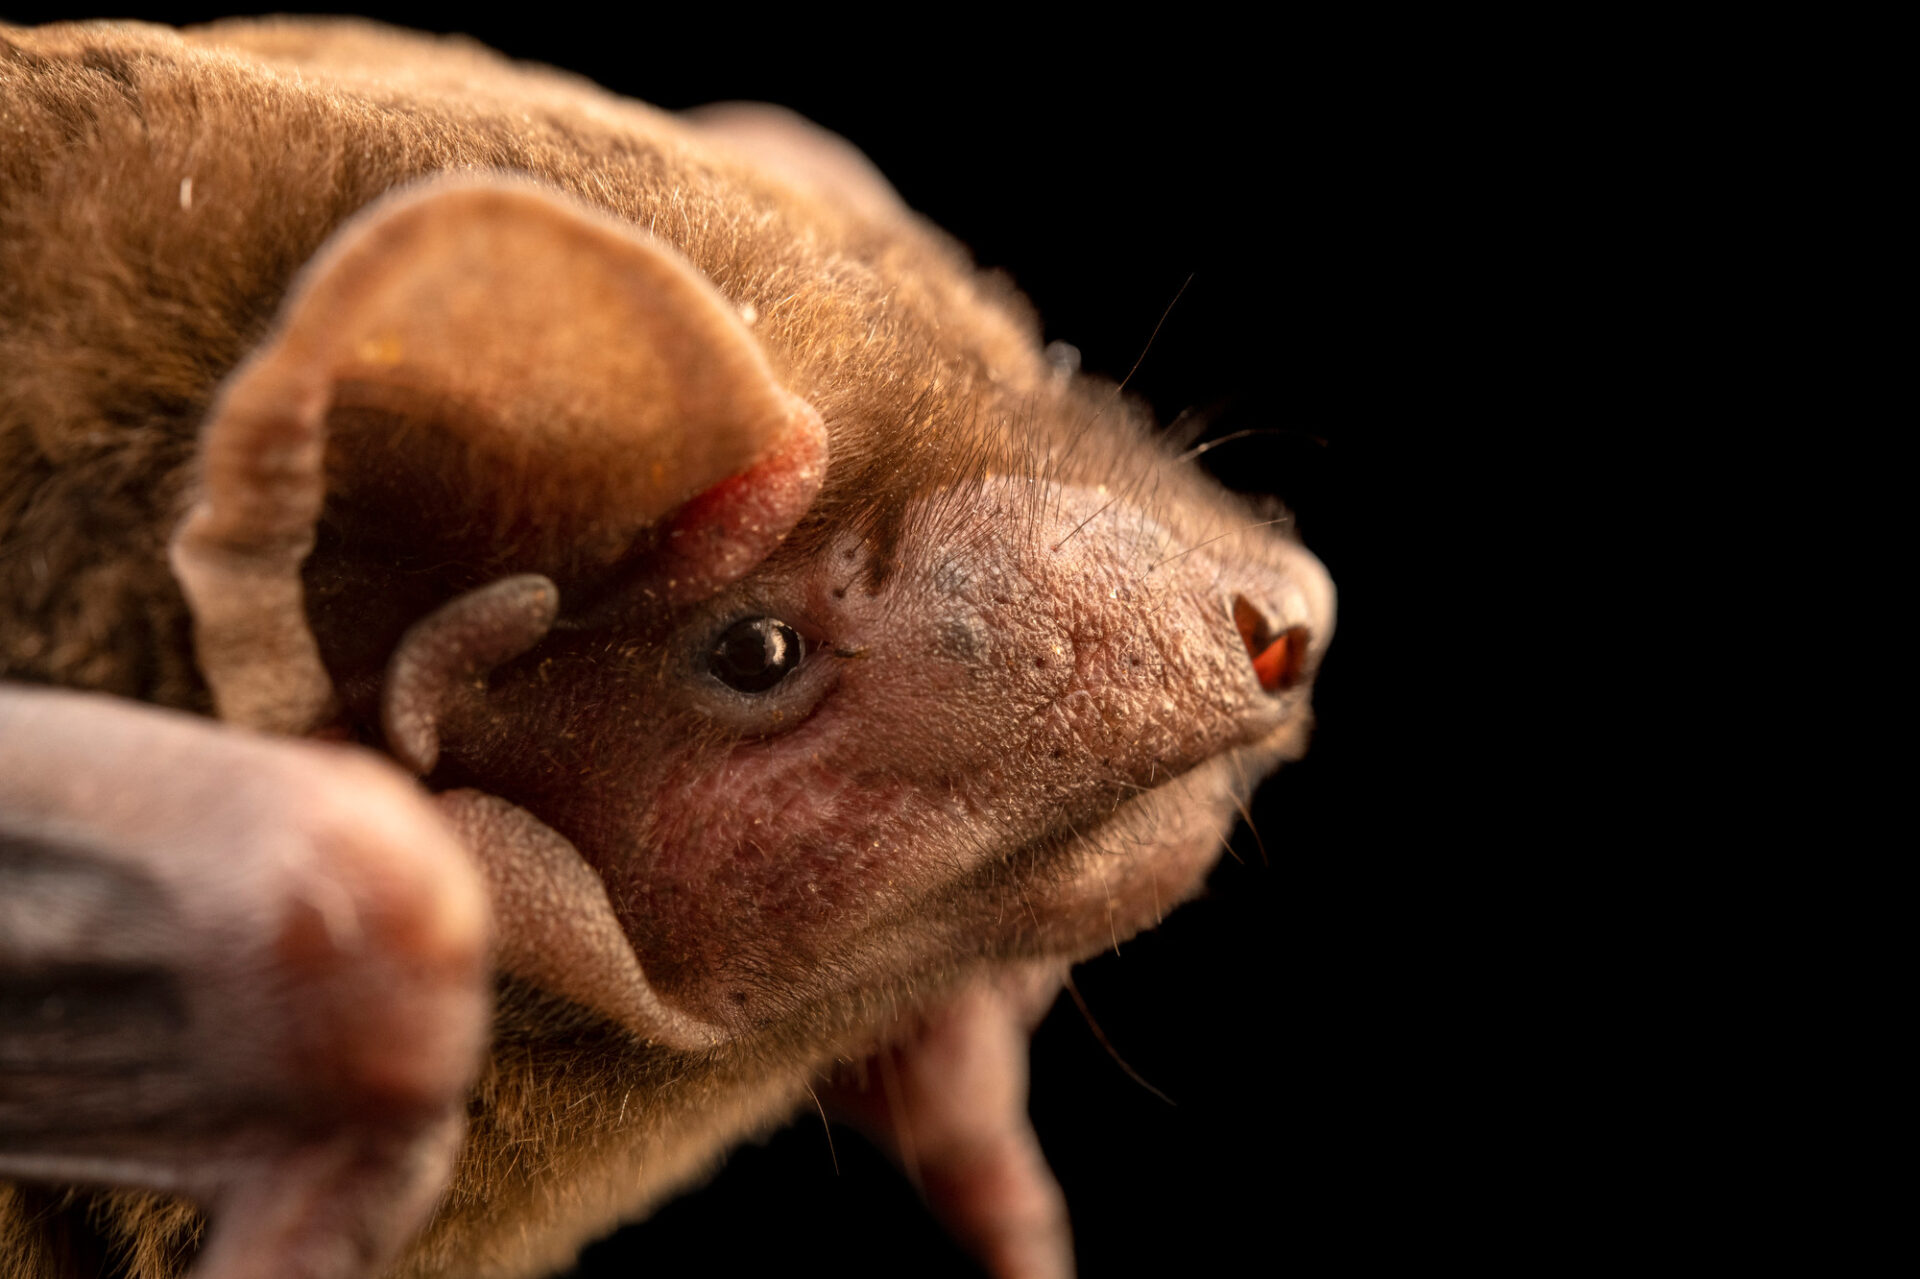 Photo: A noctule bat (Nyctalus noctula) at Wildwood Trust near Canterbury, England.